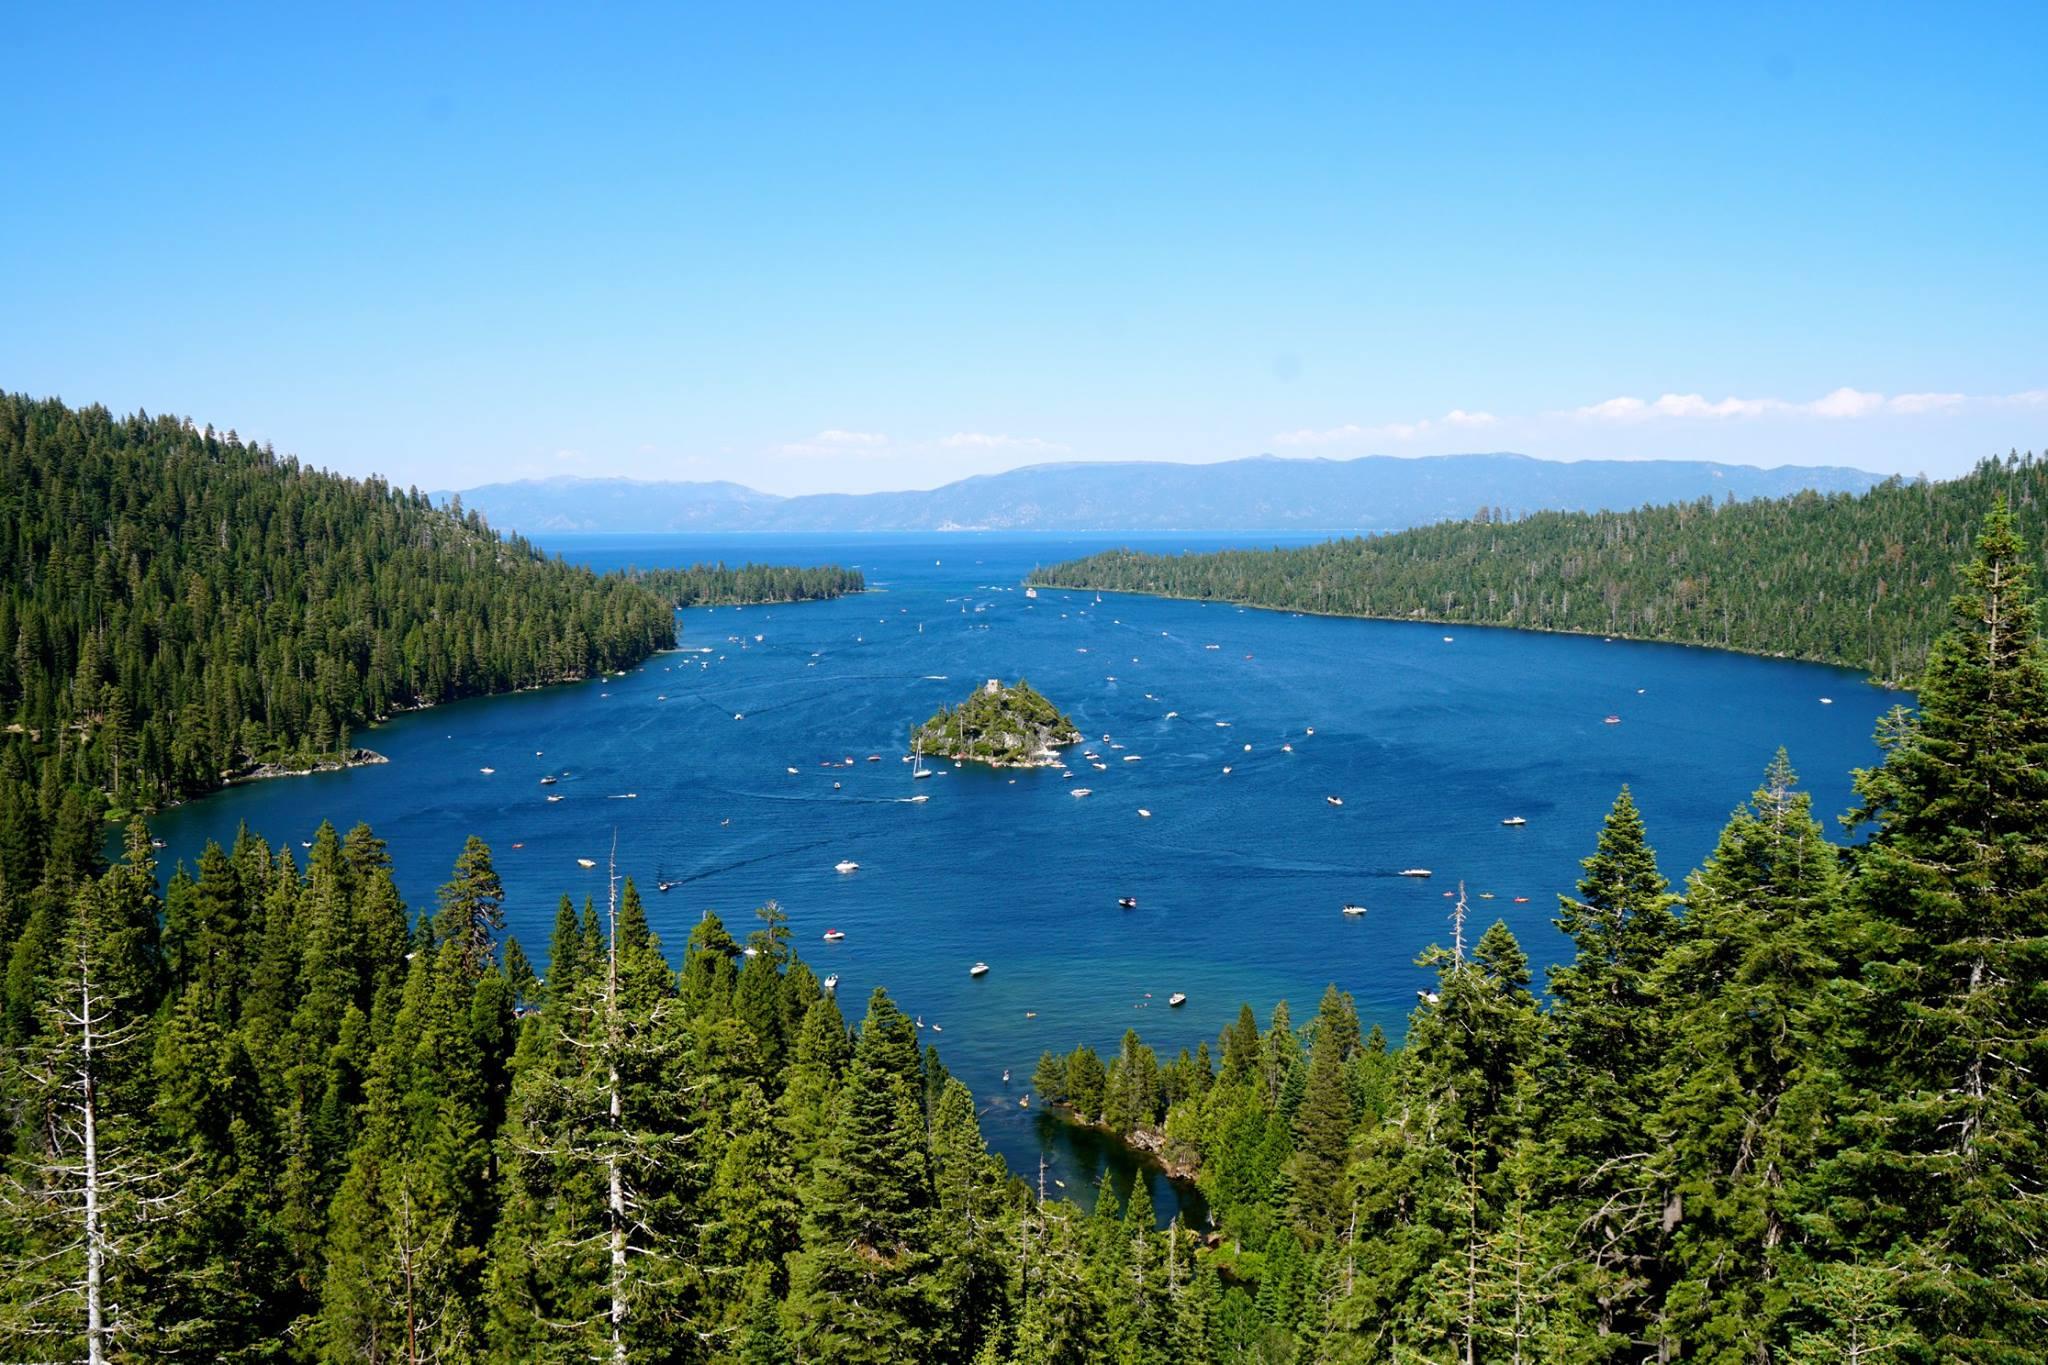 Emerald Bay, South Lake Tahoe, CA